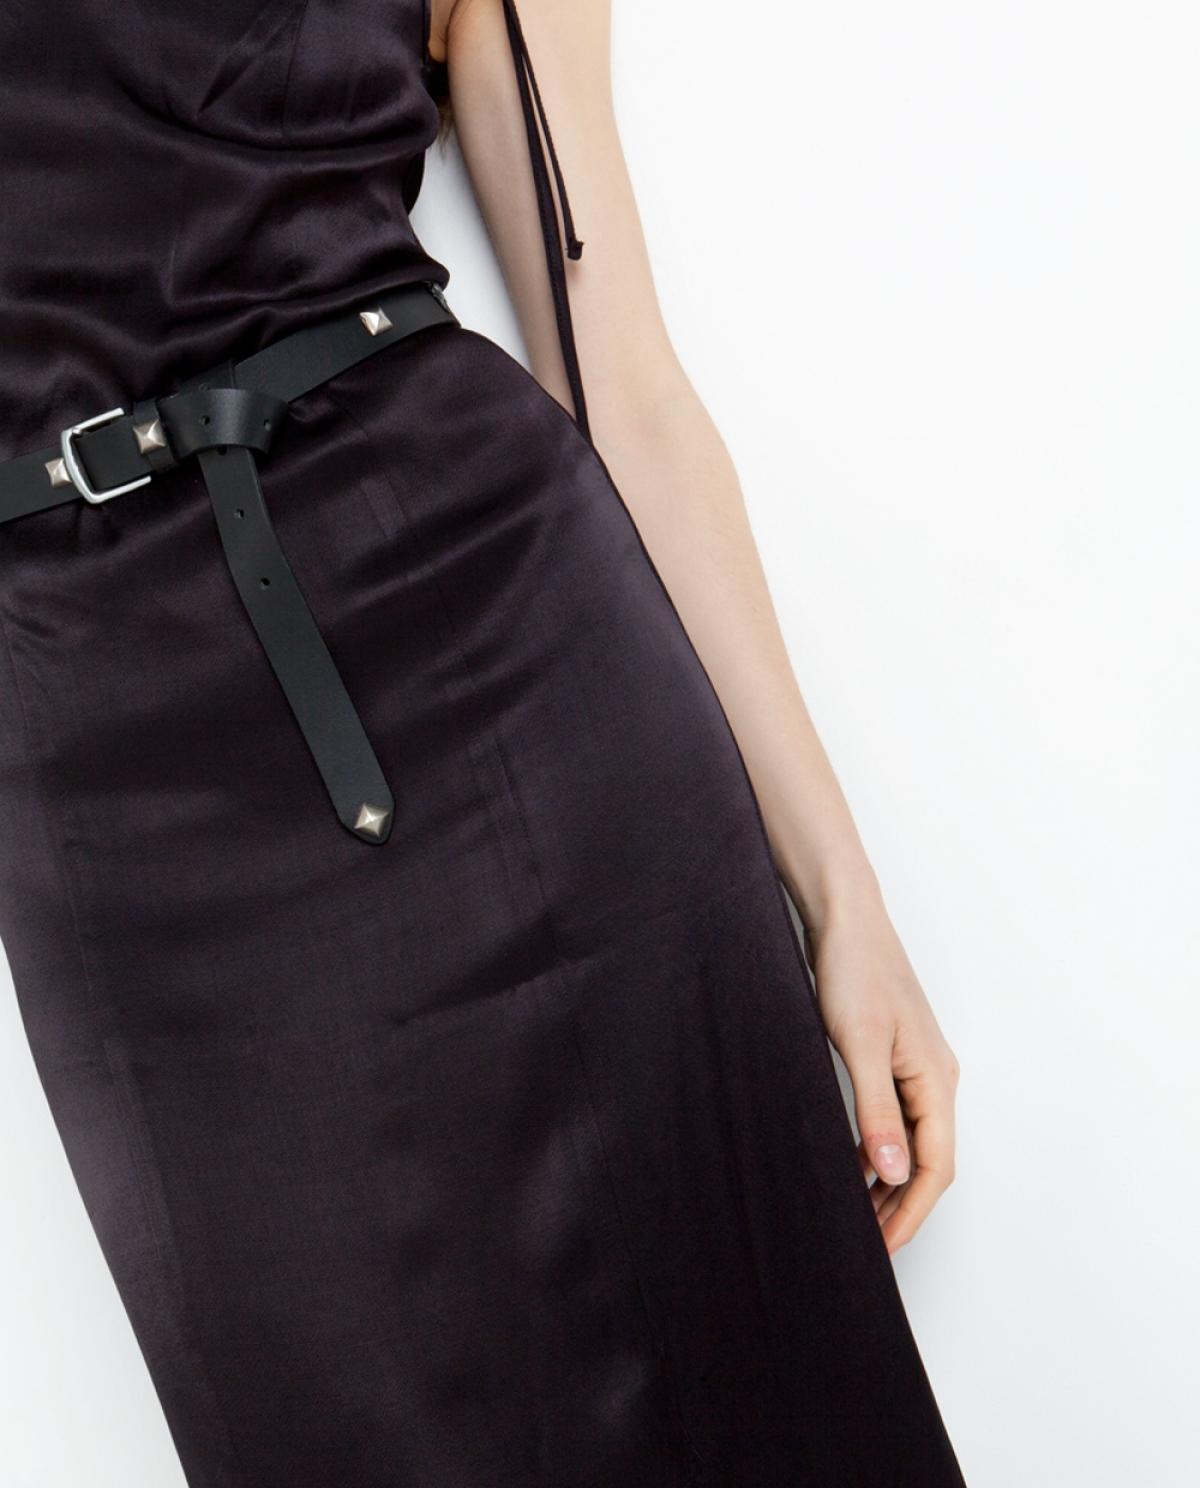 Wild Studded Leather Belt